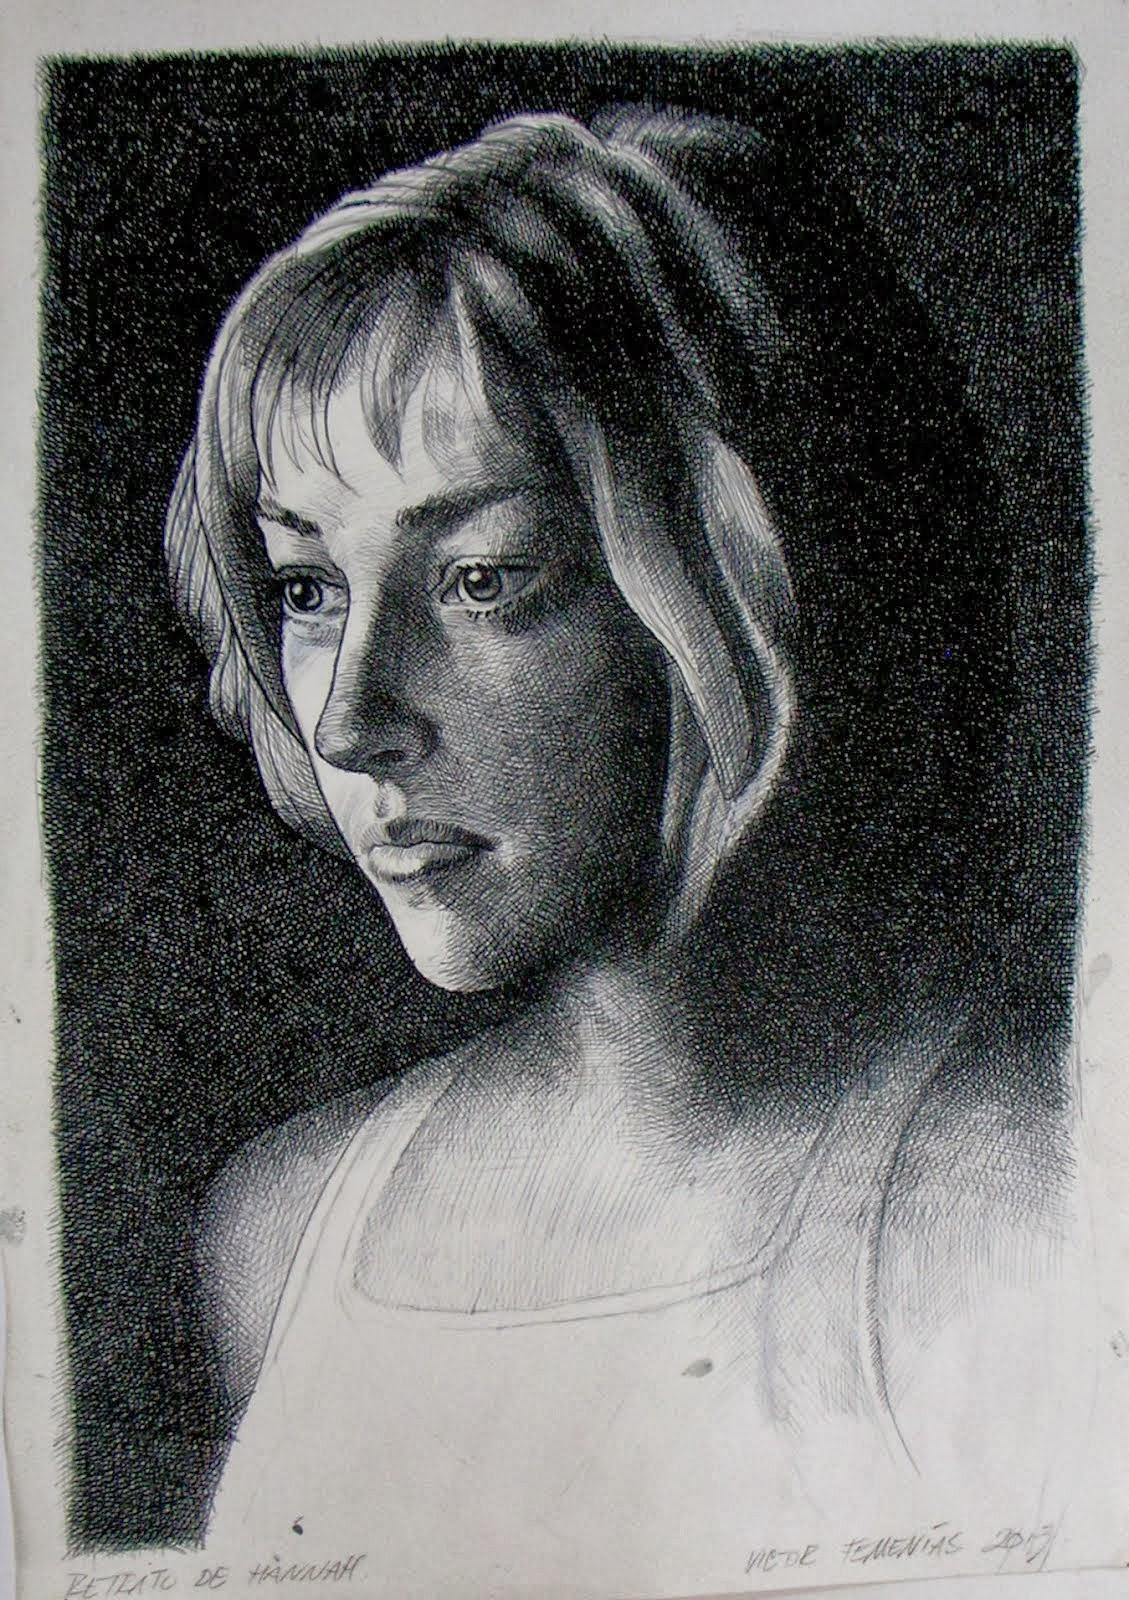 Retrato de Hannah